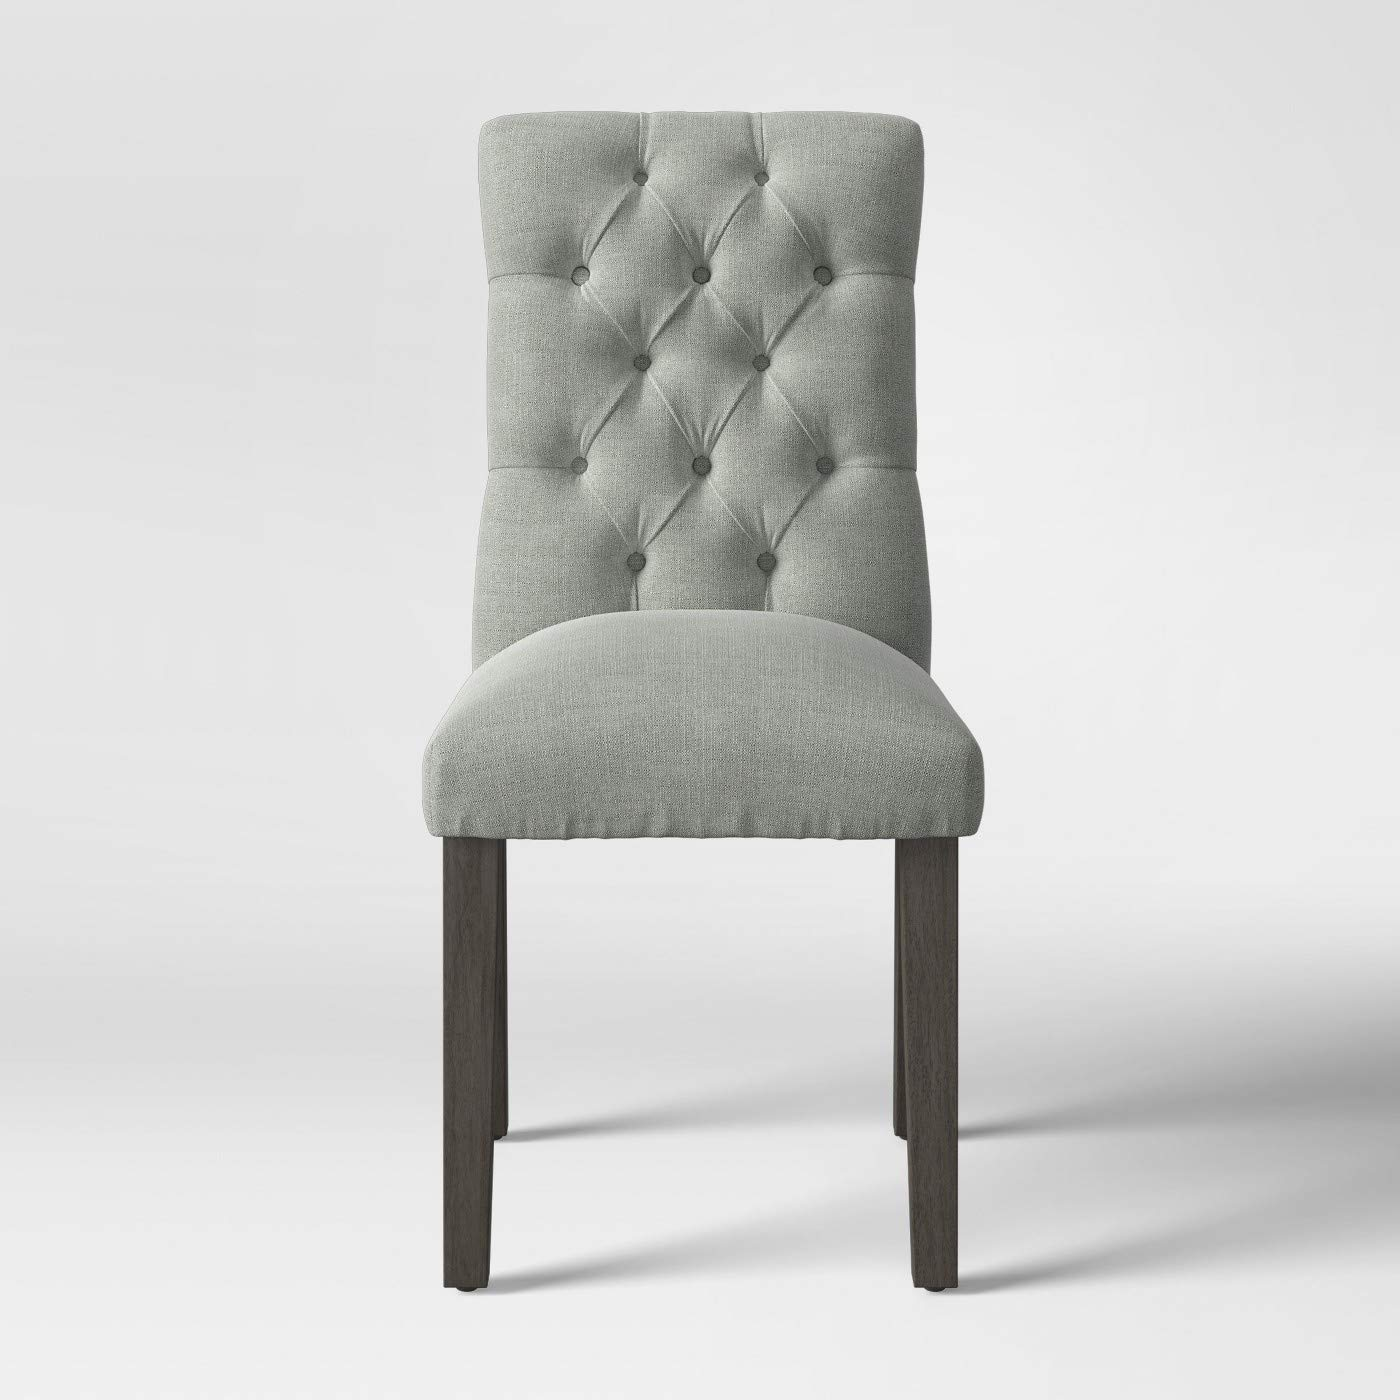 Phenomenal Amazon Com Threshold Brookline Tufted Dining Chair Gray Ibusinesslaw Wood Chair Design Ideas Ibusinesslaworg